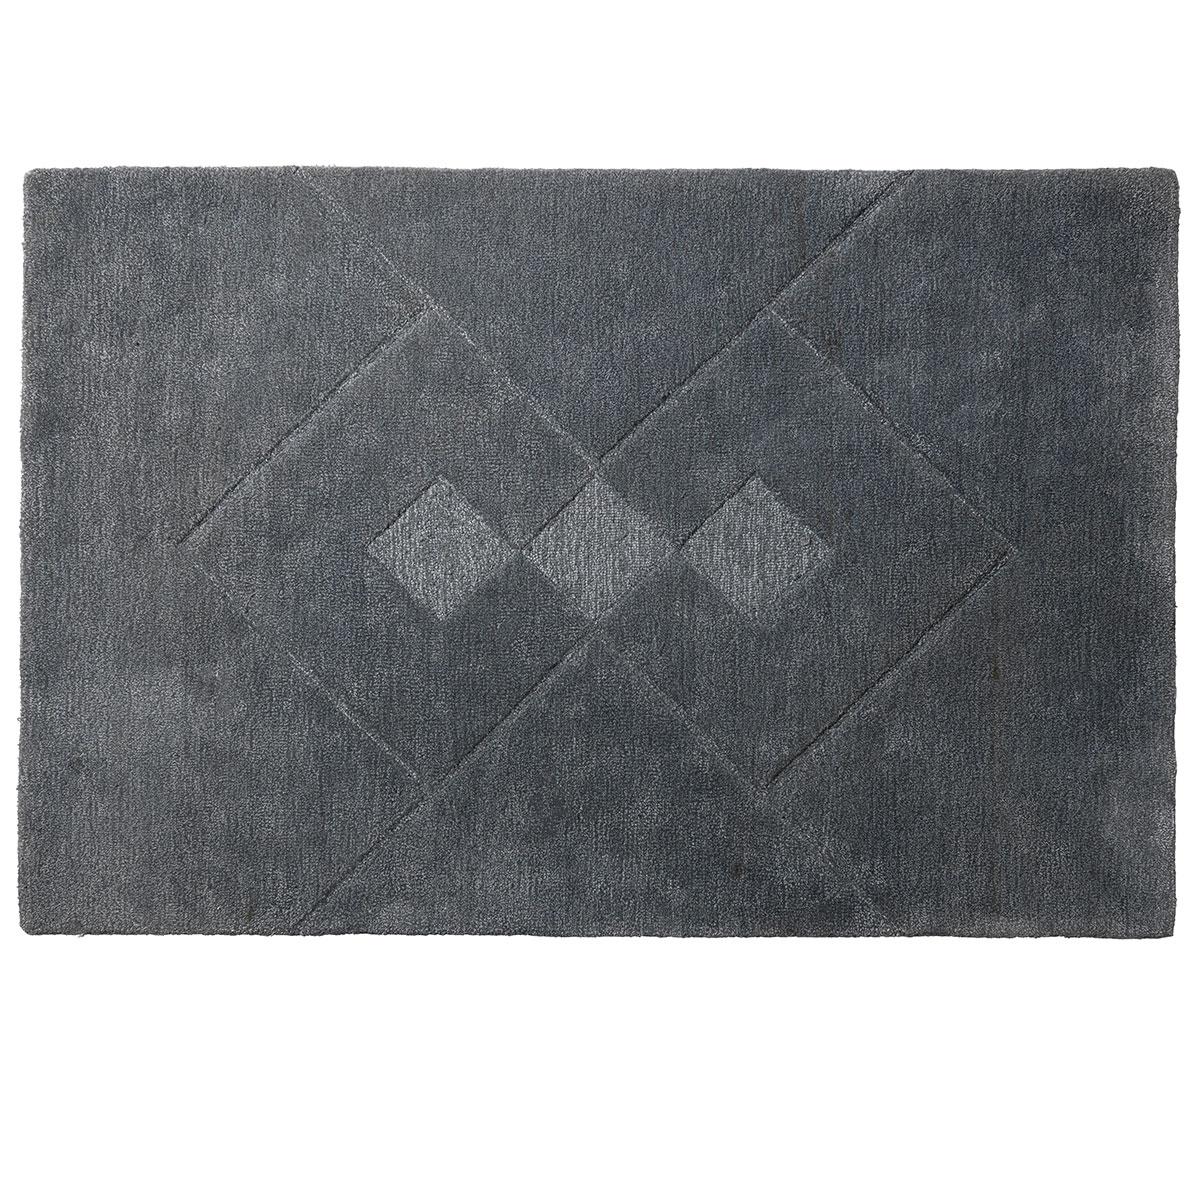 Image of   Bettina Juul Eilersen gulvtæppe - R7 Hera - 120 x 180 cm - Grå